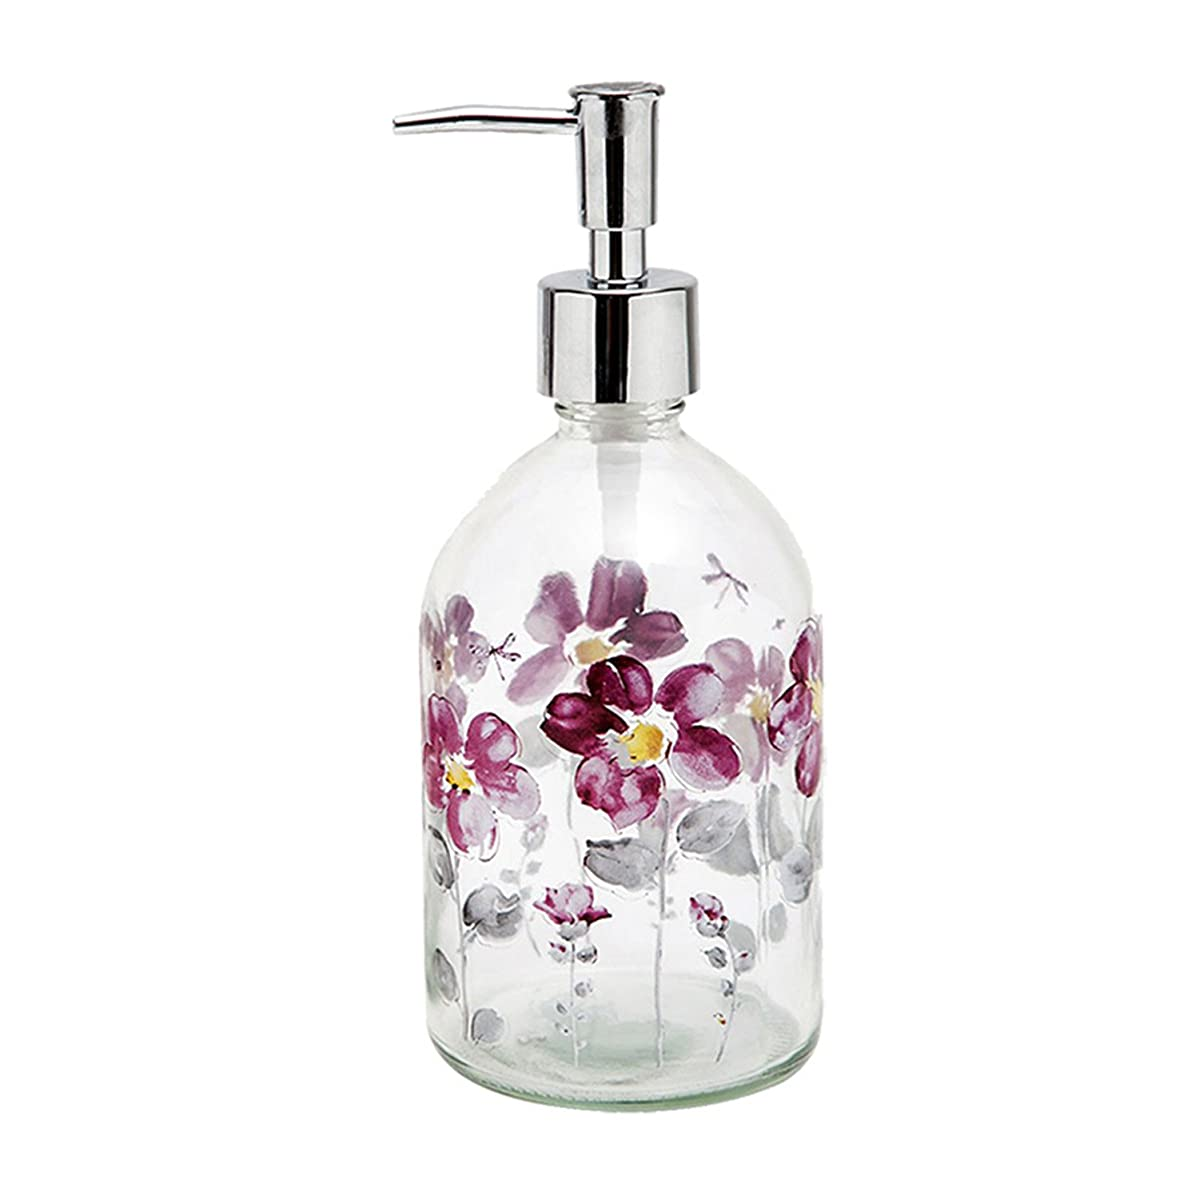 Topadorn 17oz Flower Glass Soap Dispenser Bottle with Plastic Pump